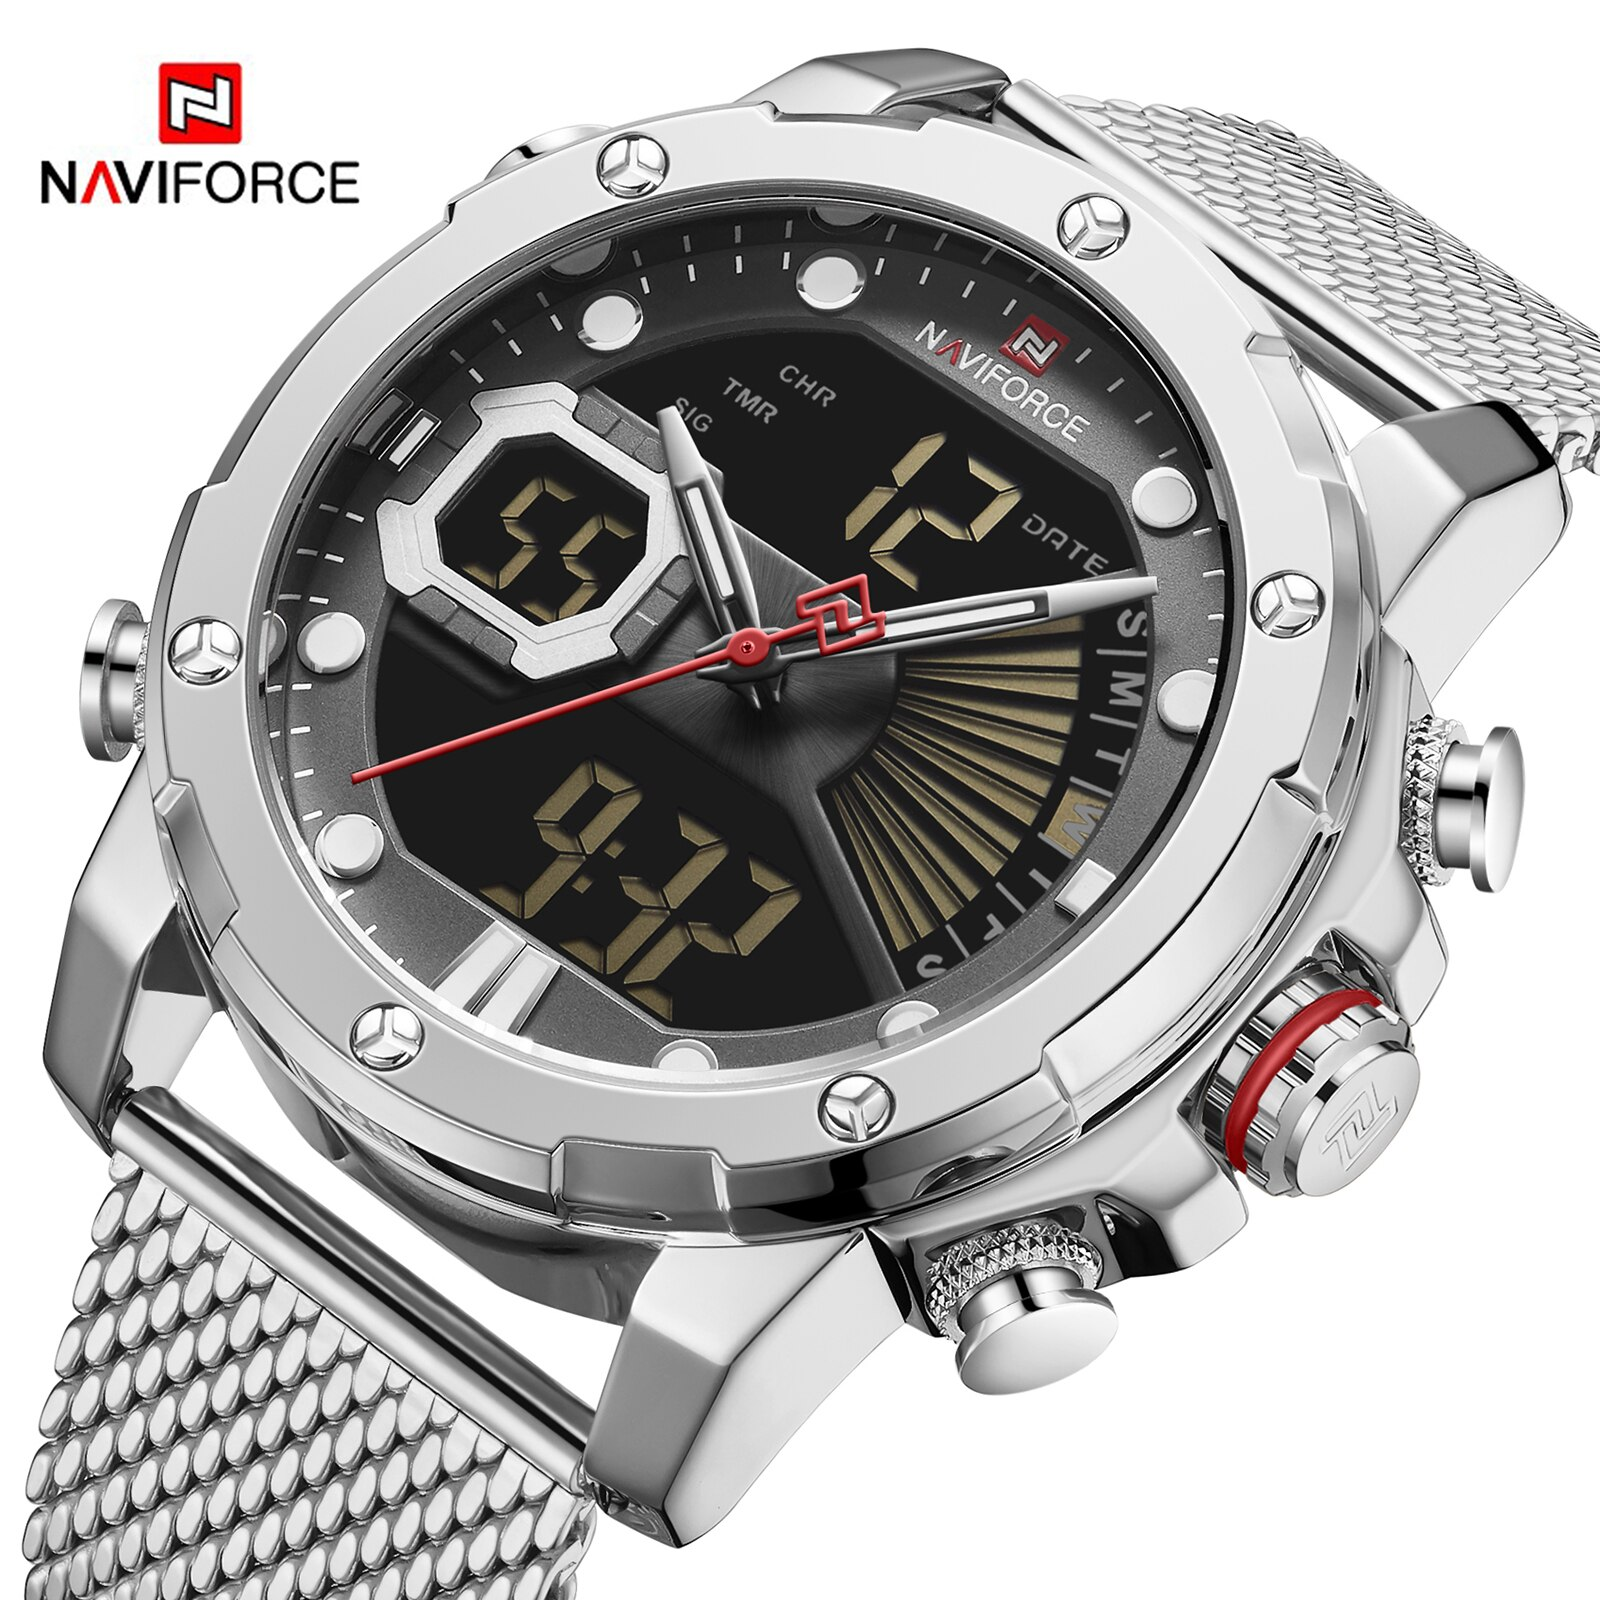 Luxury NAVIFORCE Men's Watches Military LED Digital Sports WristWatch Steel Strap Waterproof Quartz Clock Male Relogio Masculino